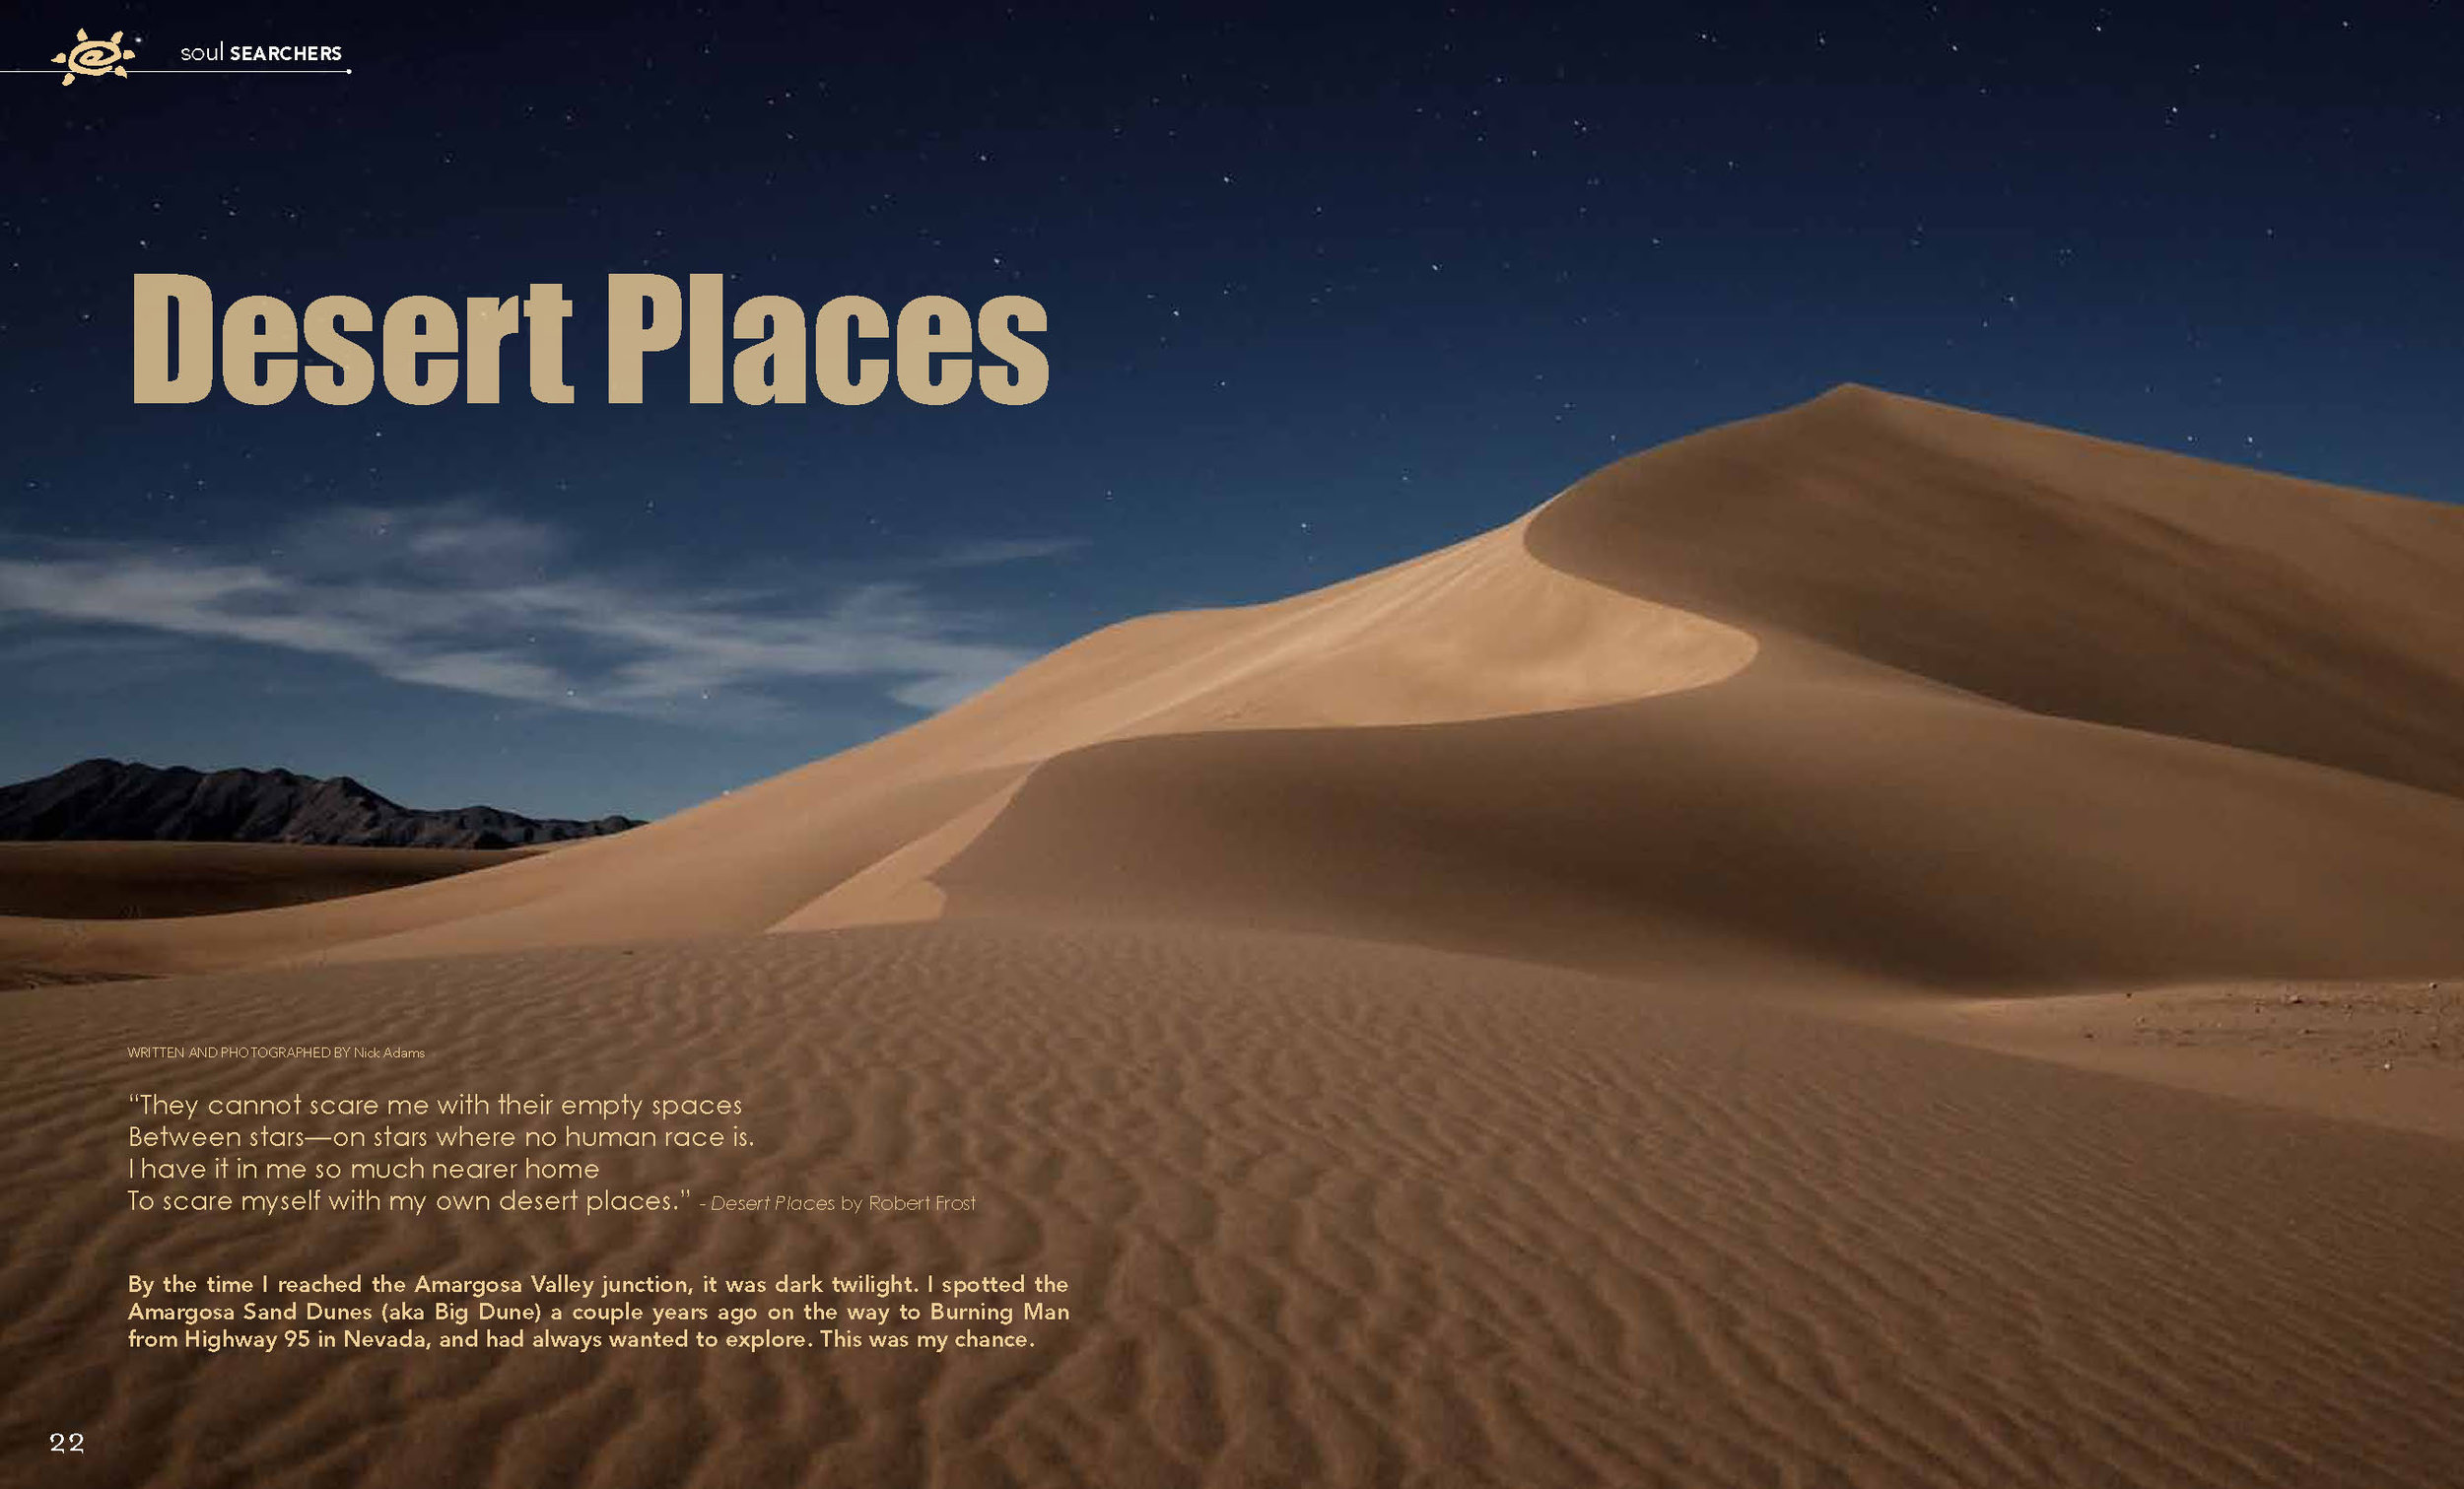 Amargosa Dunes by Moonlight